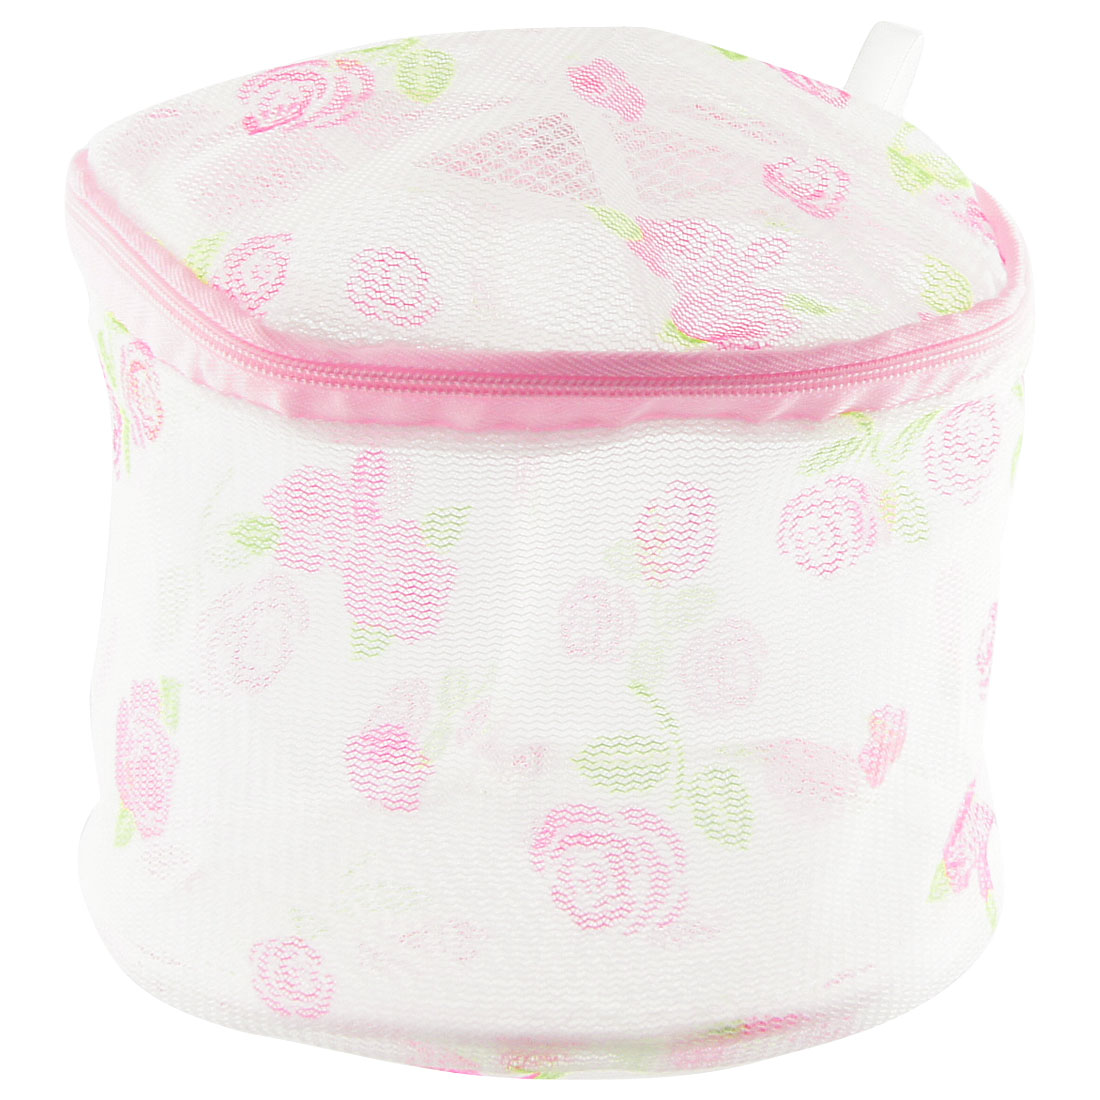 Rose Print Zipper Mesh Nylon Laundry Underwear Washing Bag